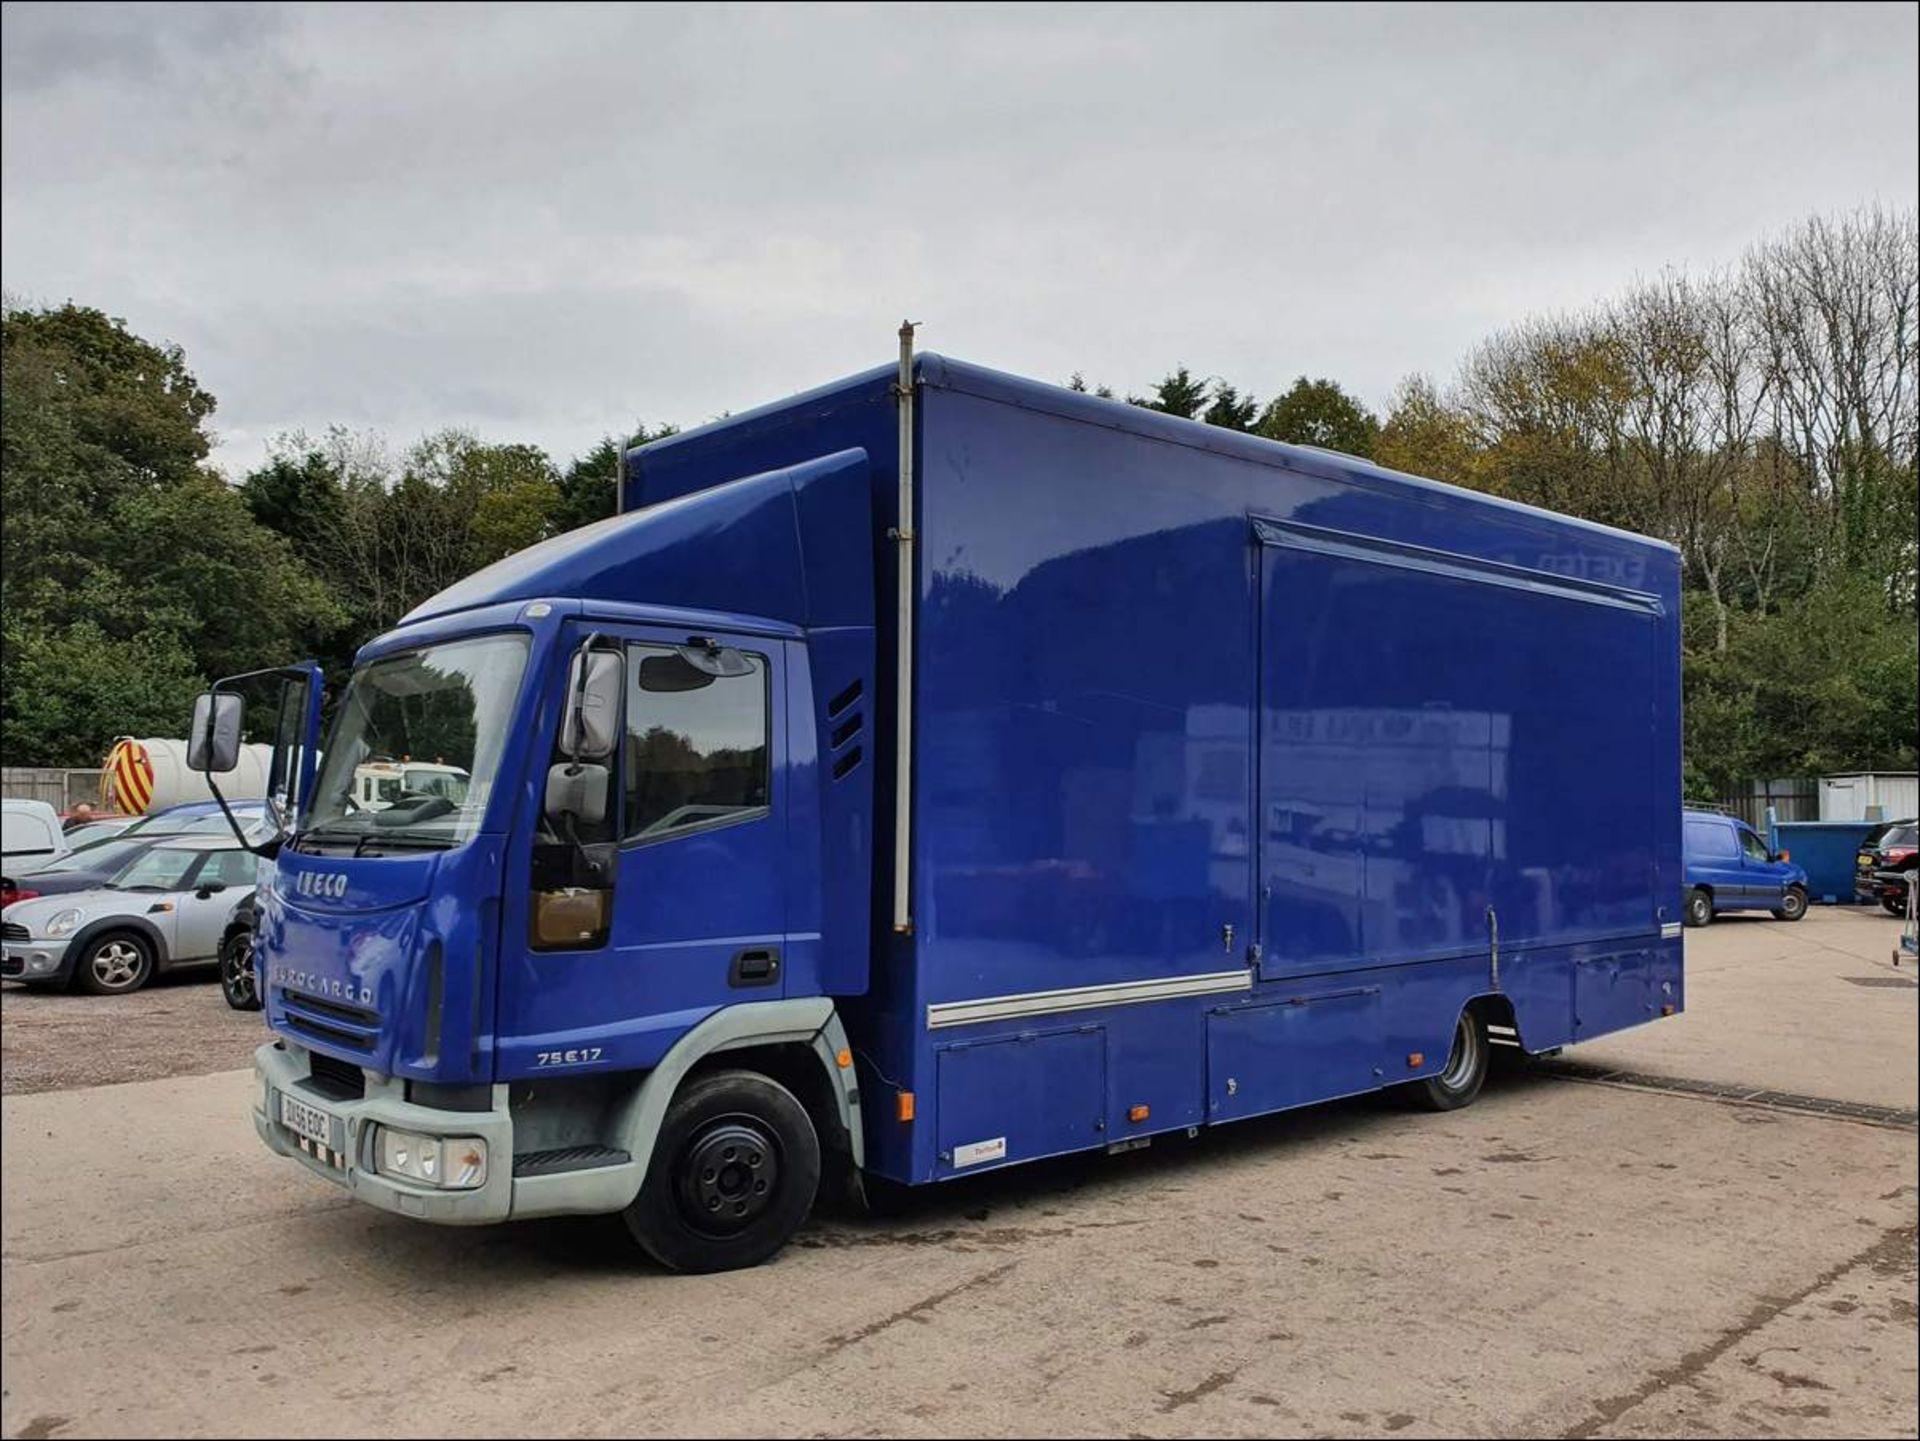 06/56 IVECO EUROCARGO EXHIBITION VEHICLE - 3920cc (Blue, 33k) - Image 9 of 13